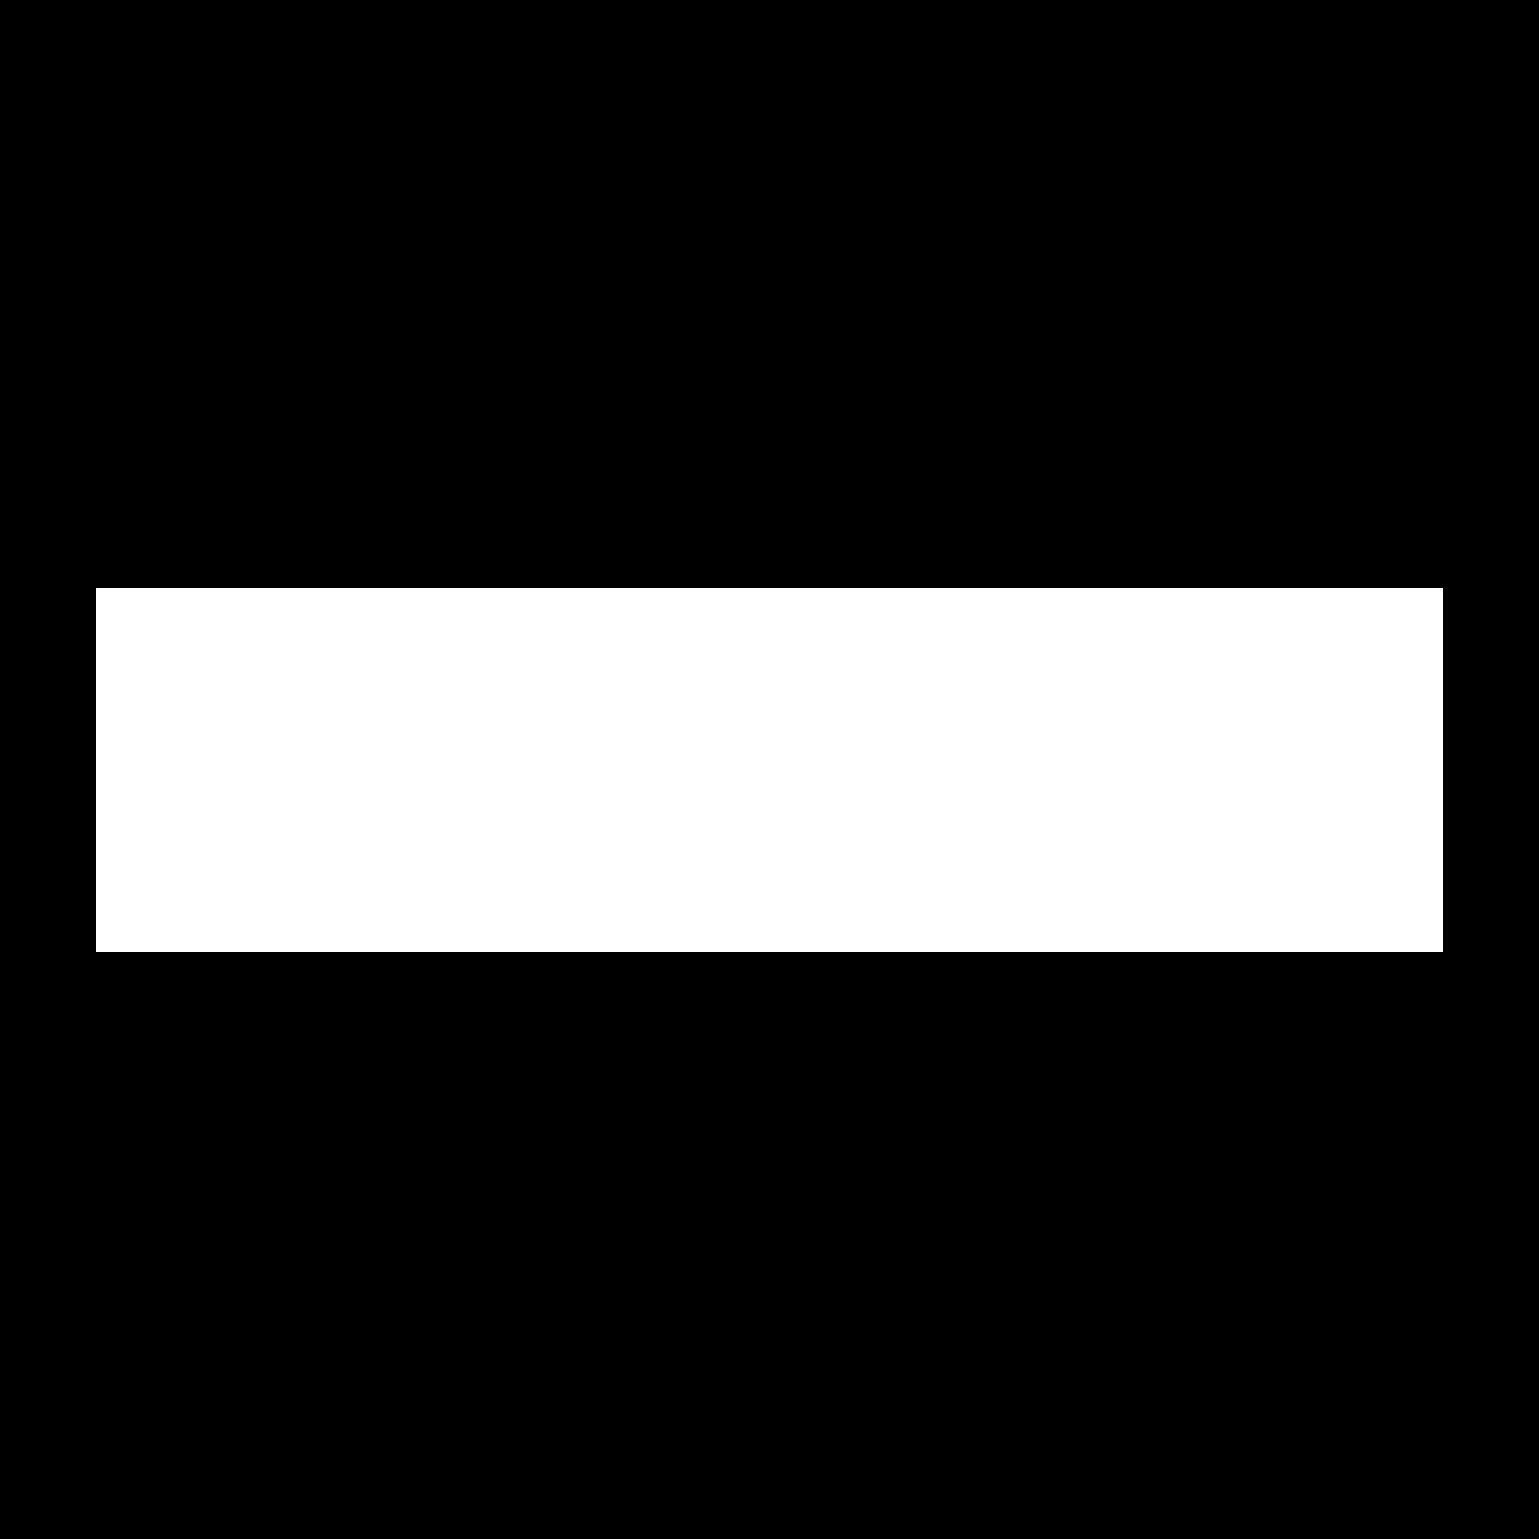 Logo RCTI - logo.bullgallery.com.png